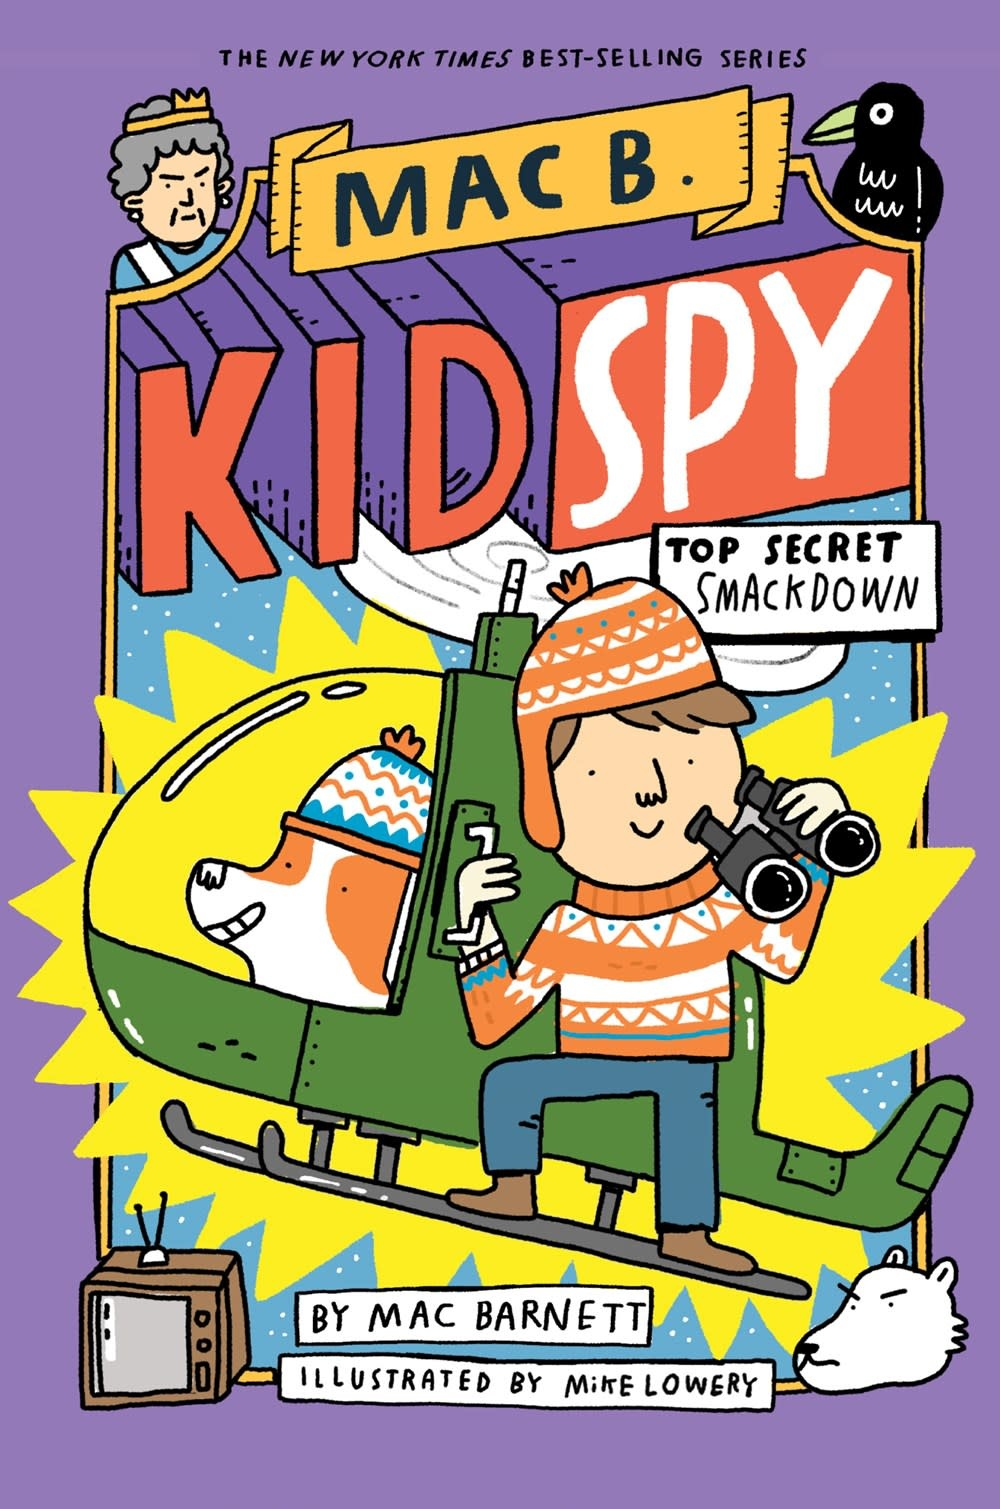 Orchard Books Mac B., Kid Spy 03 Top Secret Smackdown